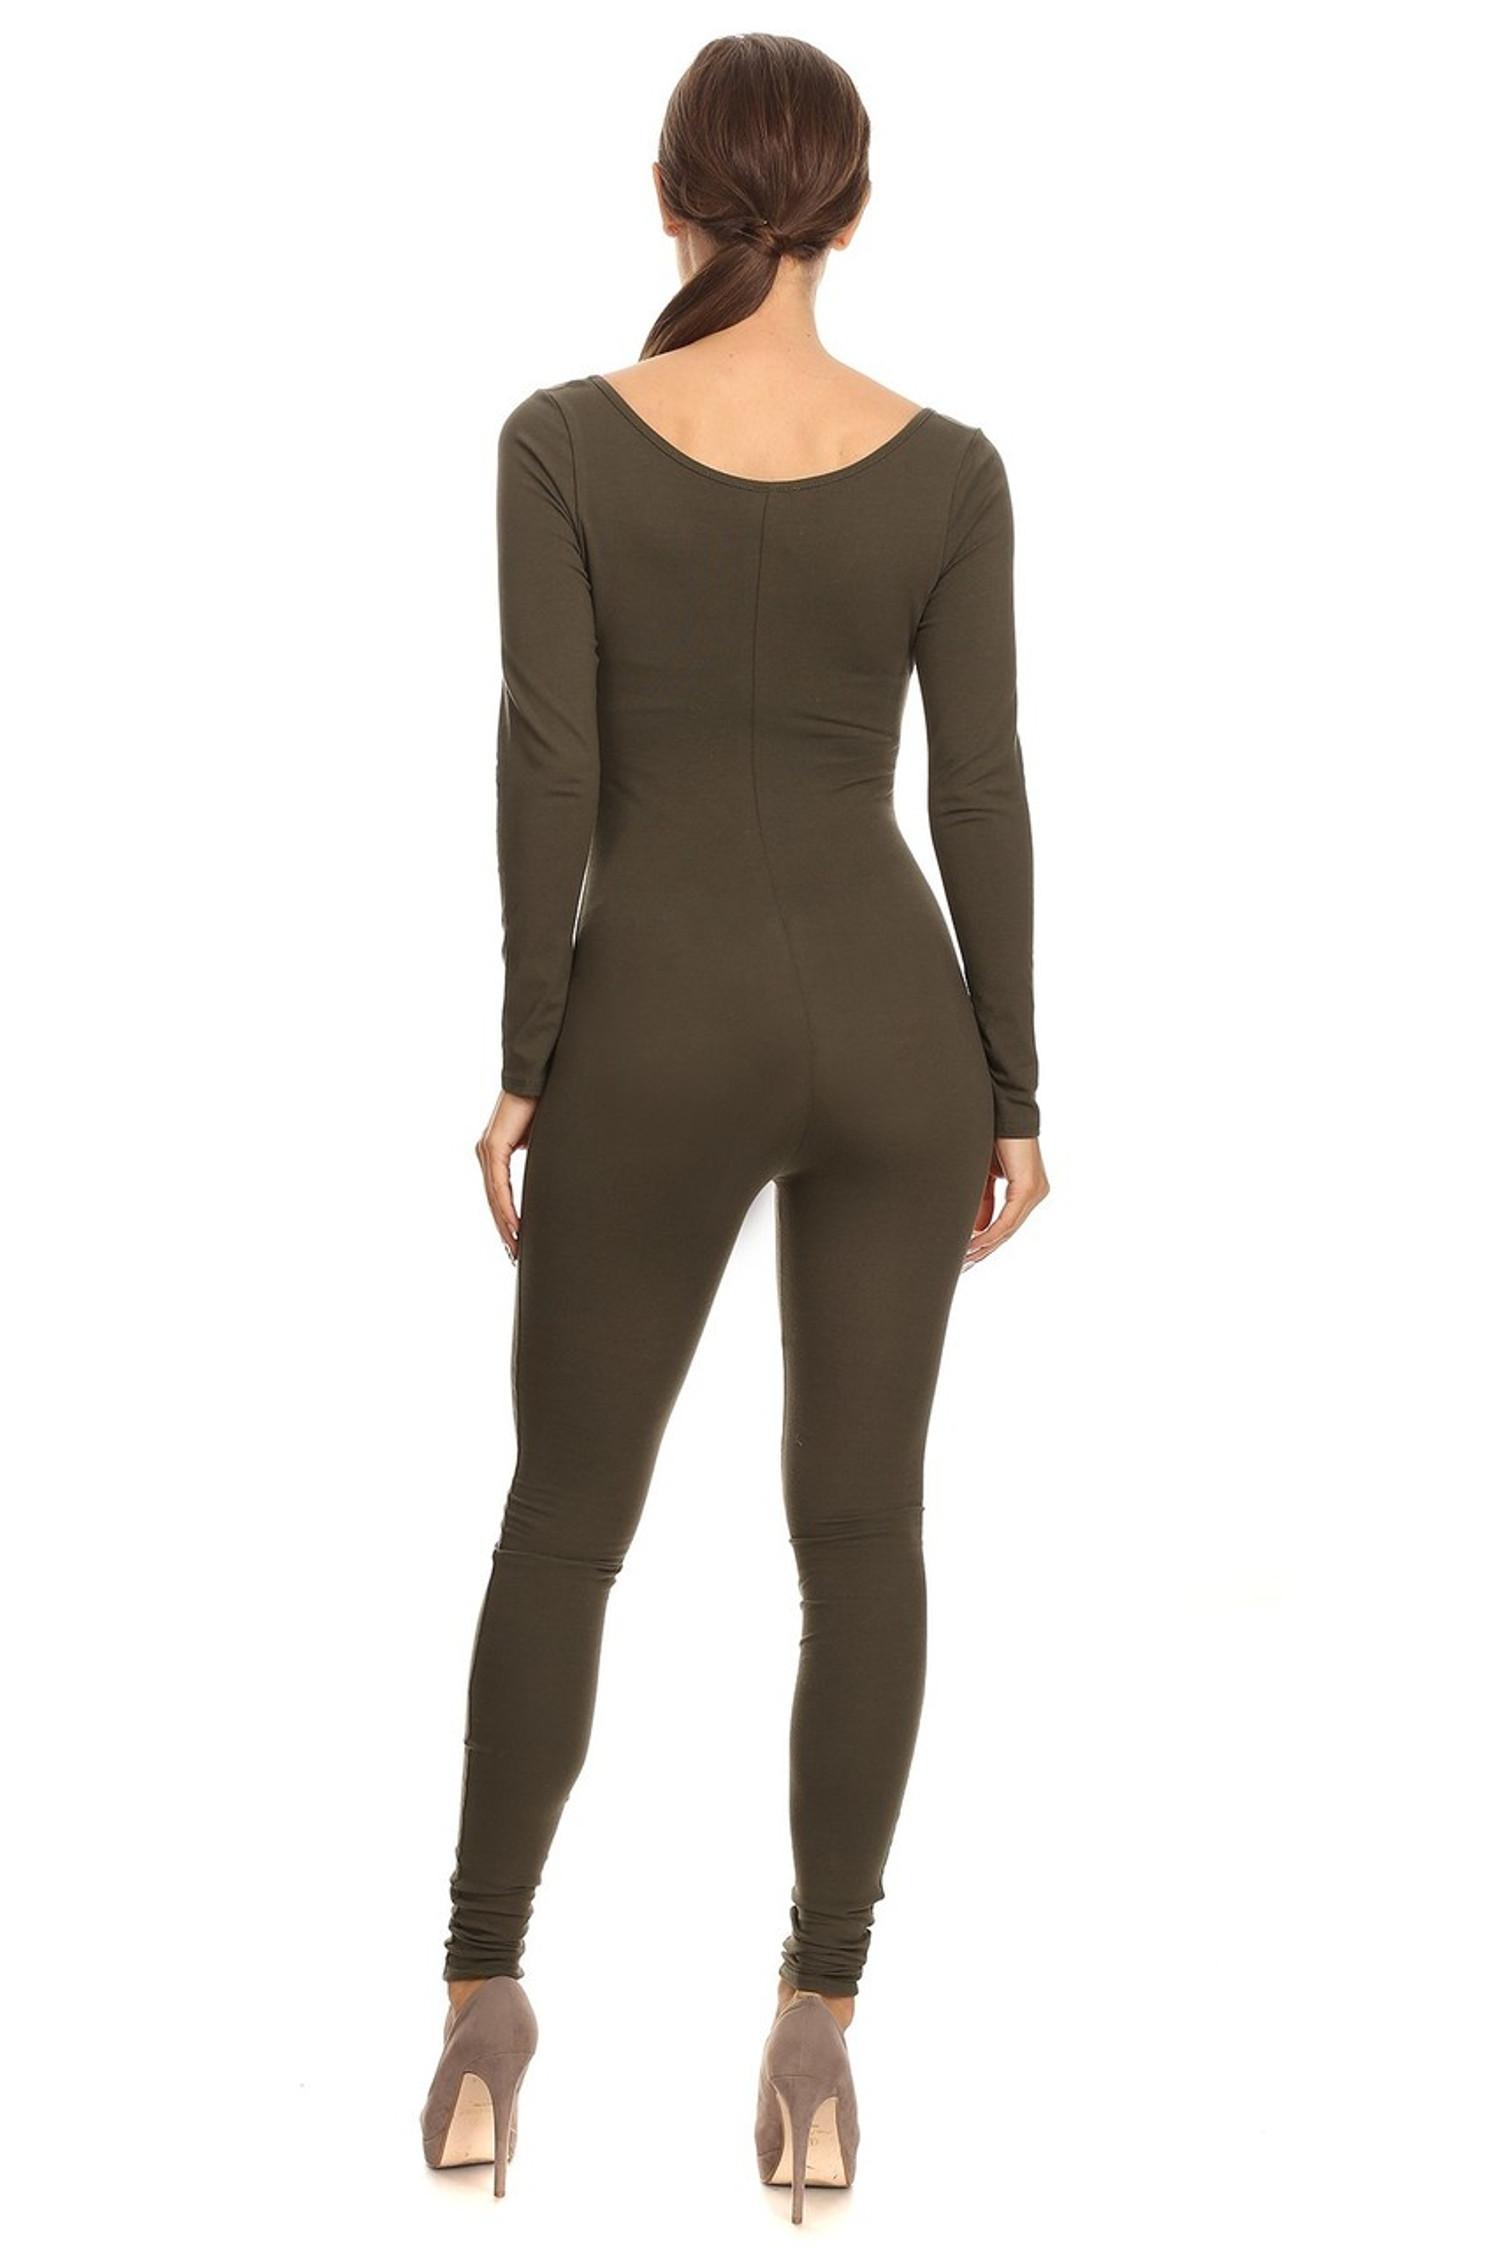 Back side image of USA Full Long Sleeve Cotton Jumpsuit